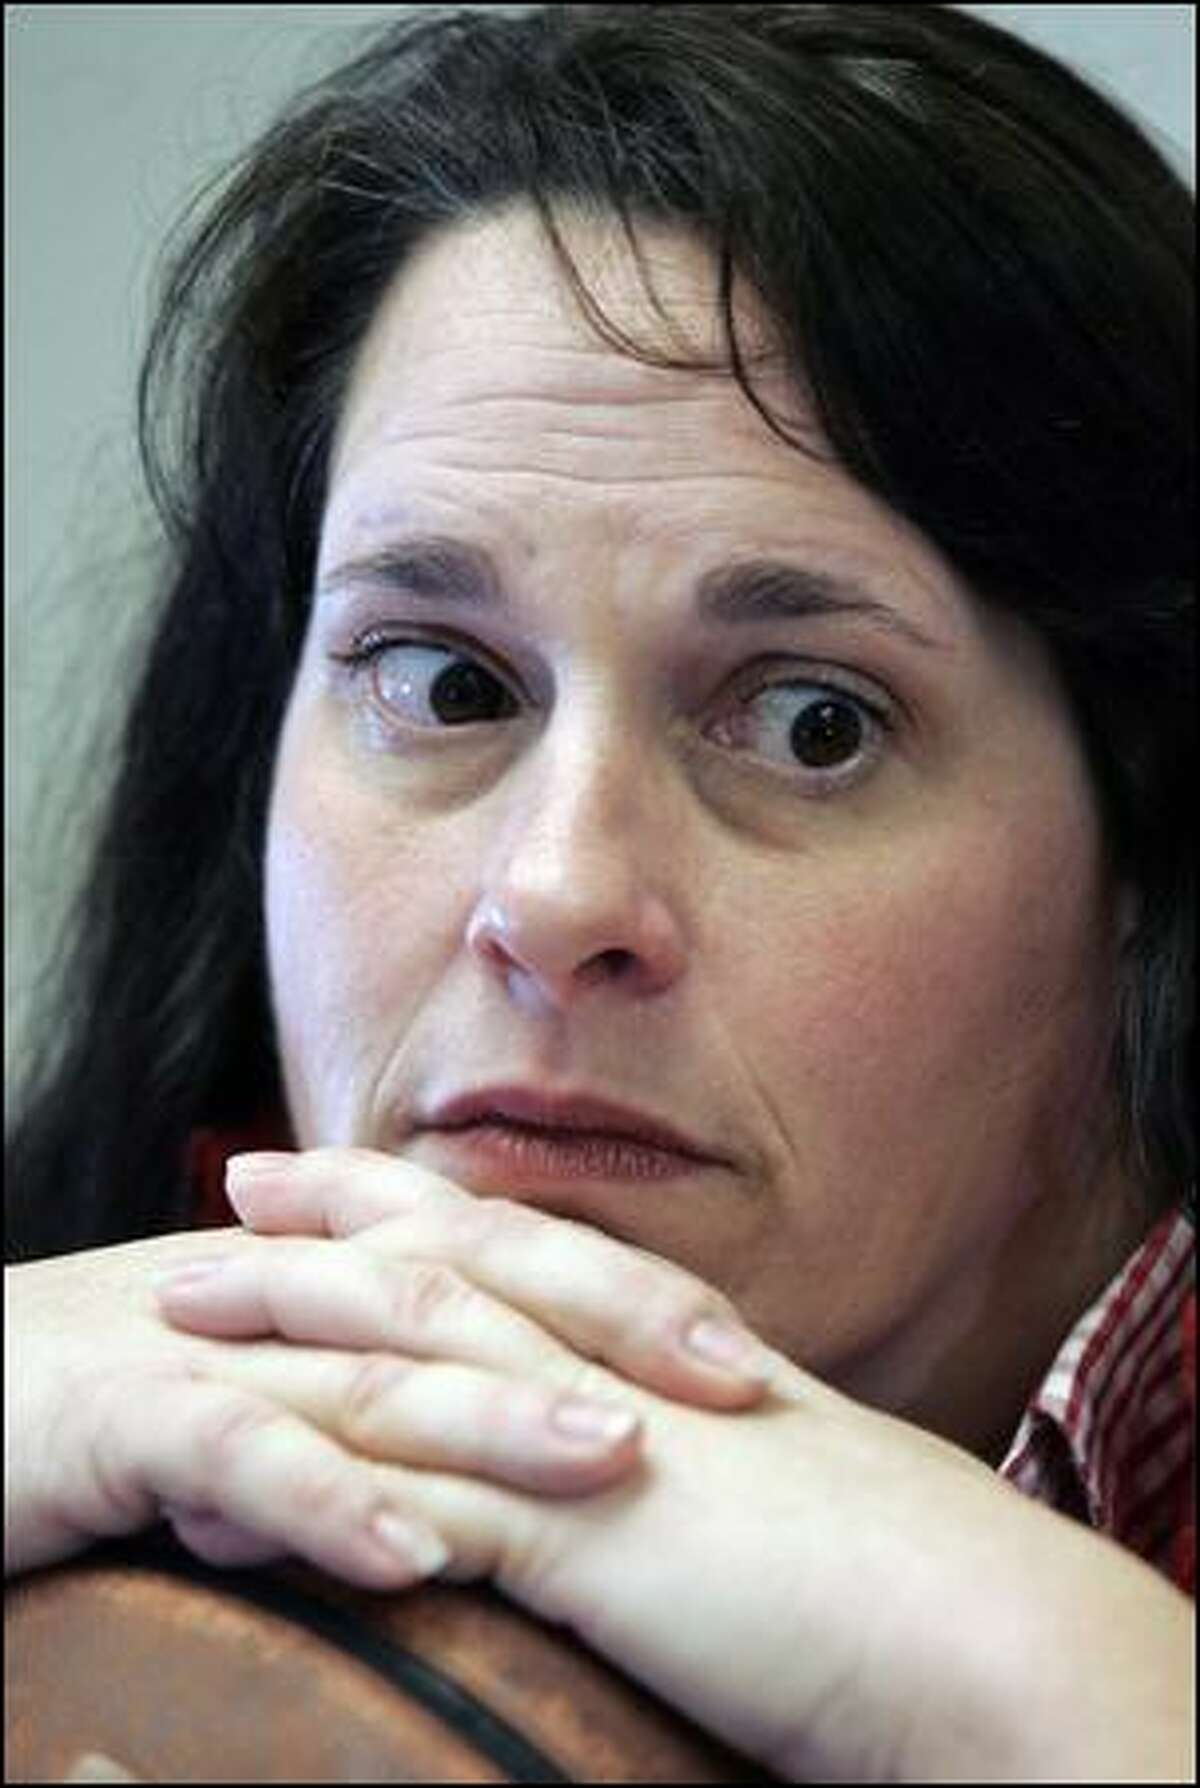 Ex-teacher Terra Solkey says she was retaliated against for raising concerns.